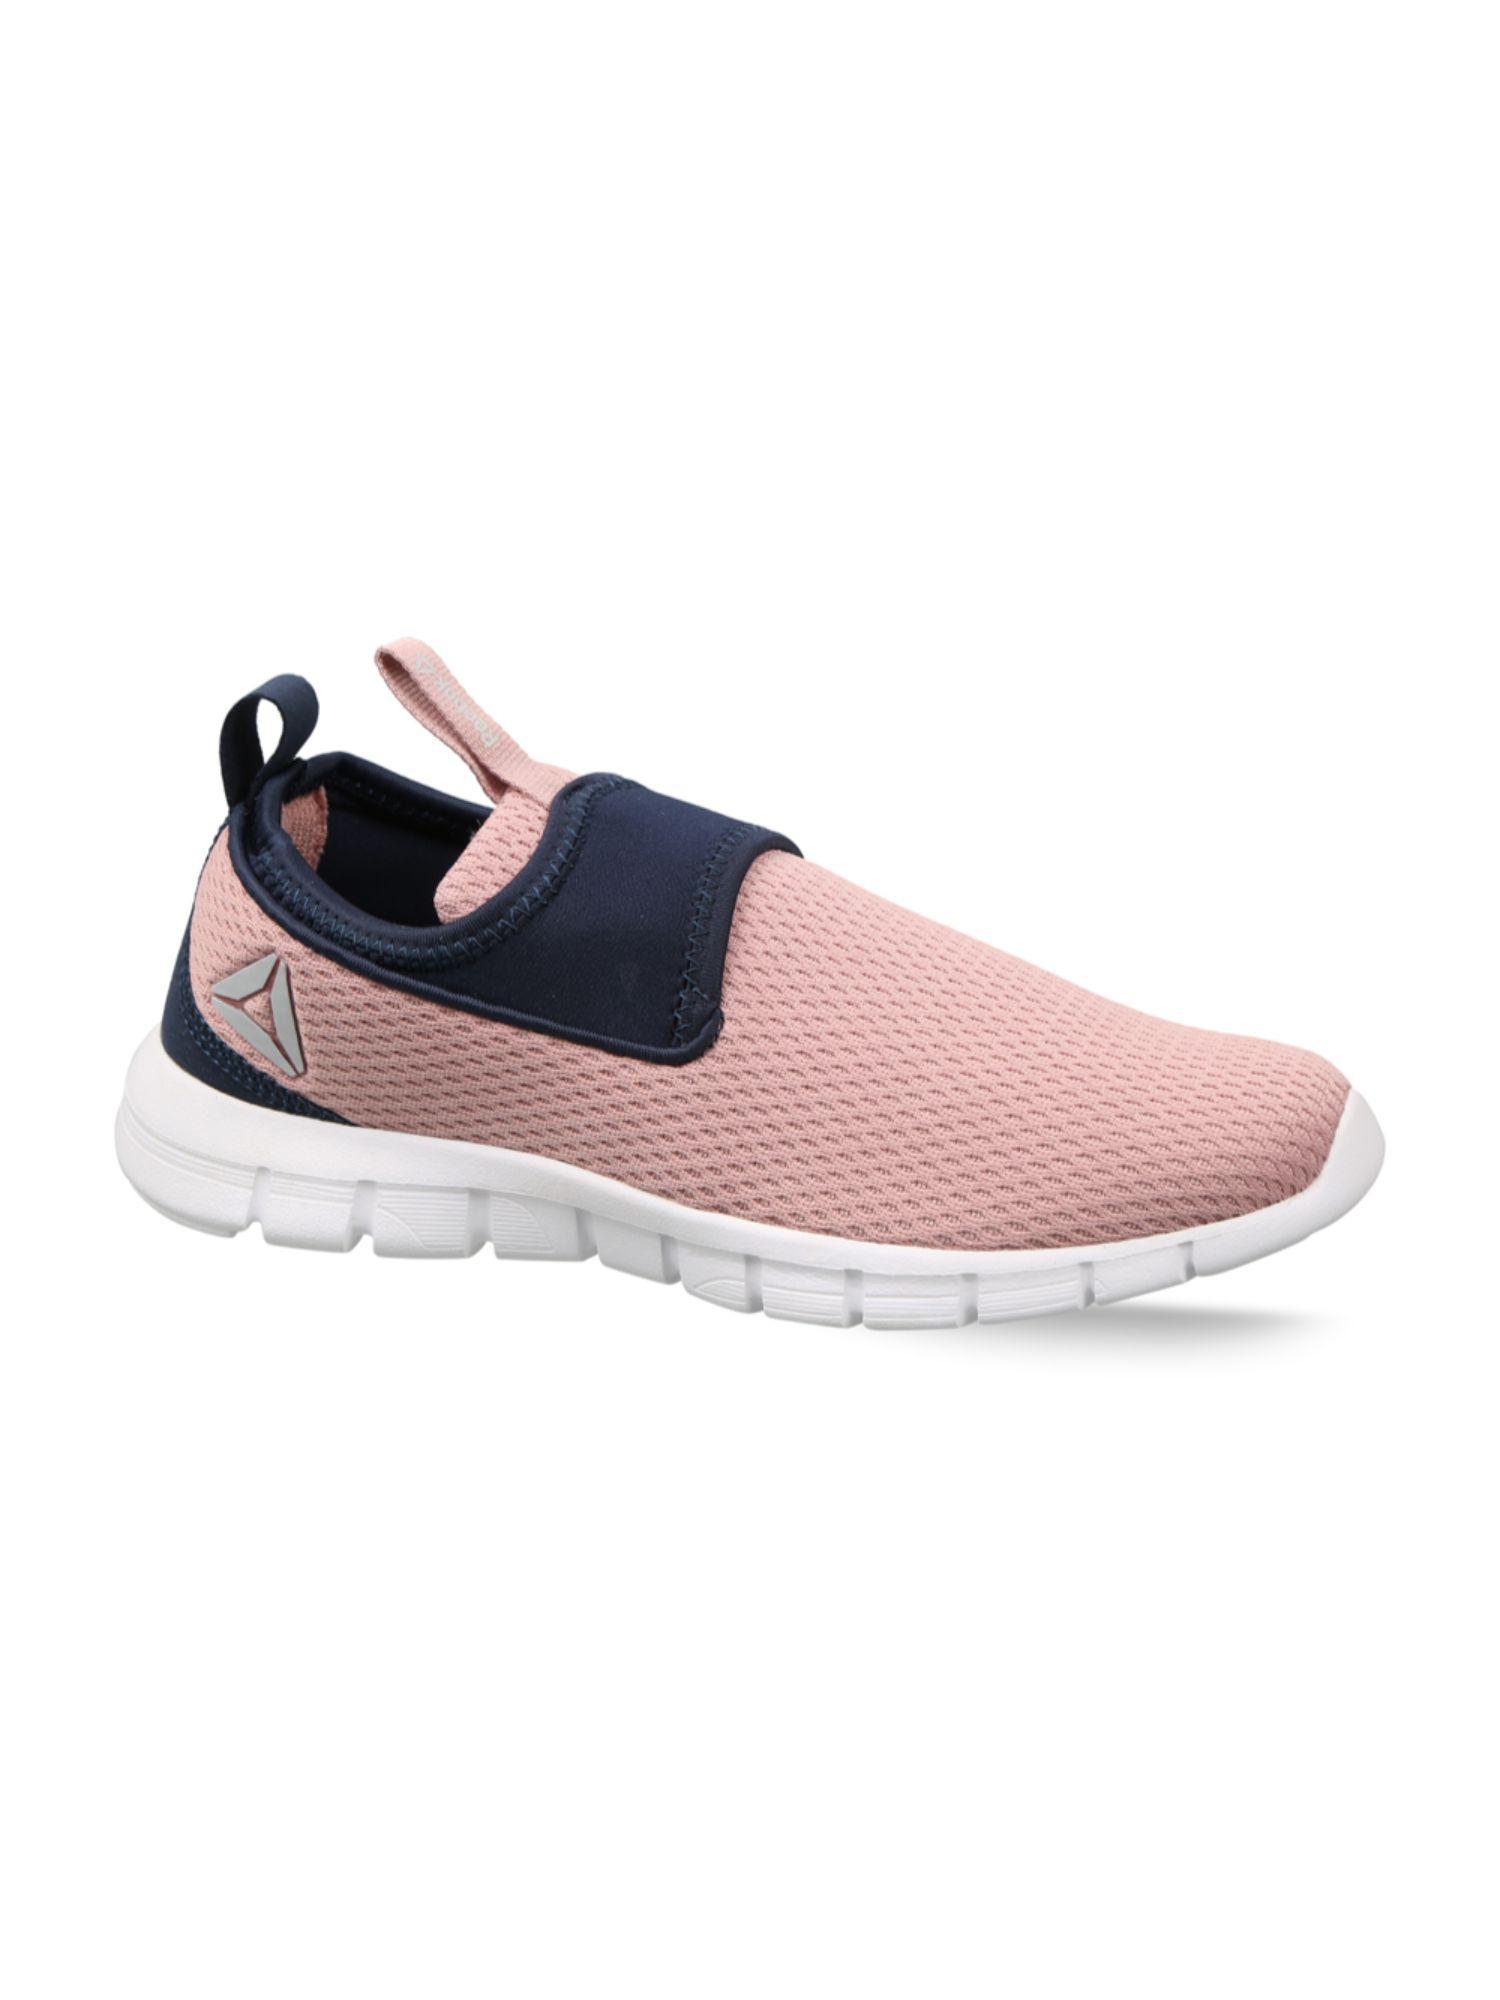 Buy Reebok Tread Walk Lite Lap Pink